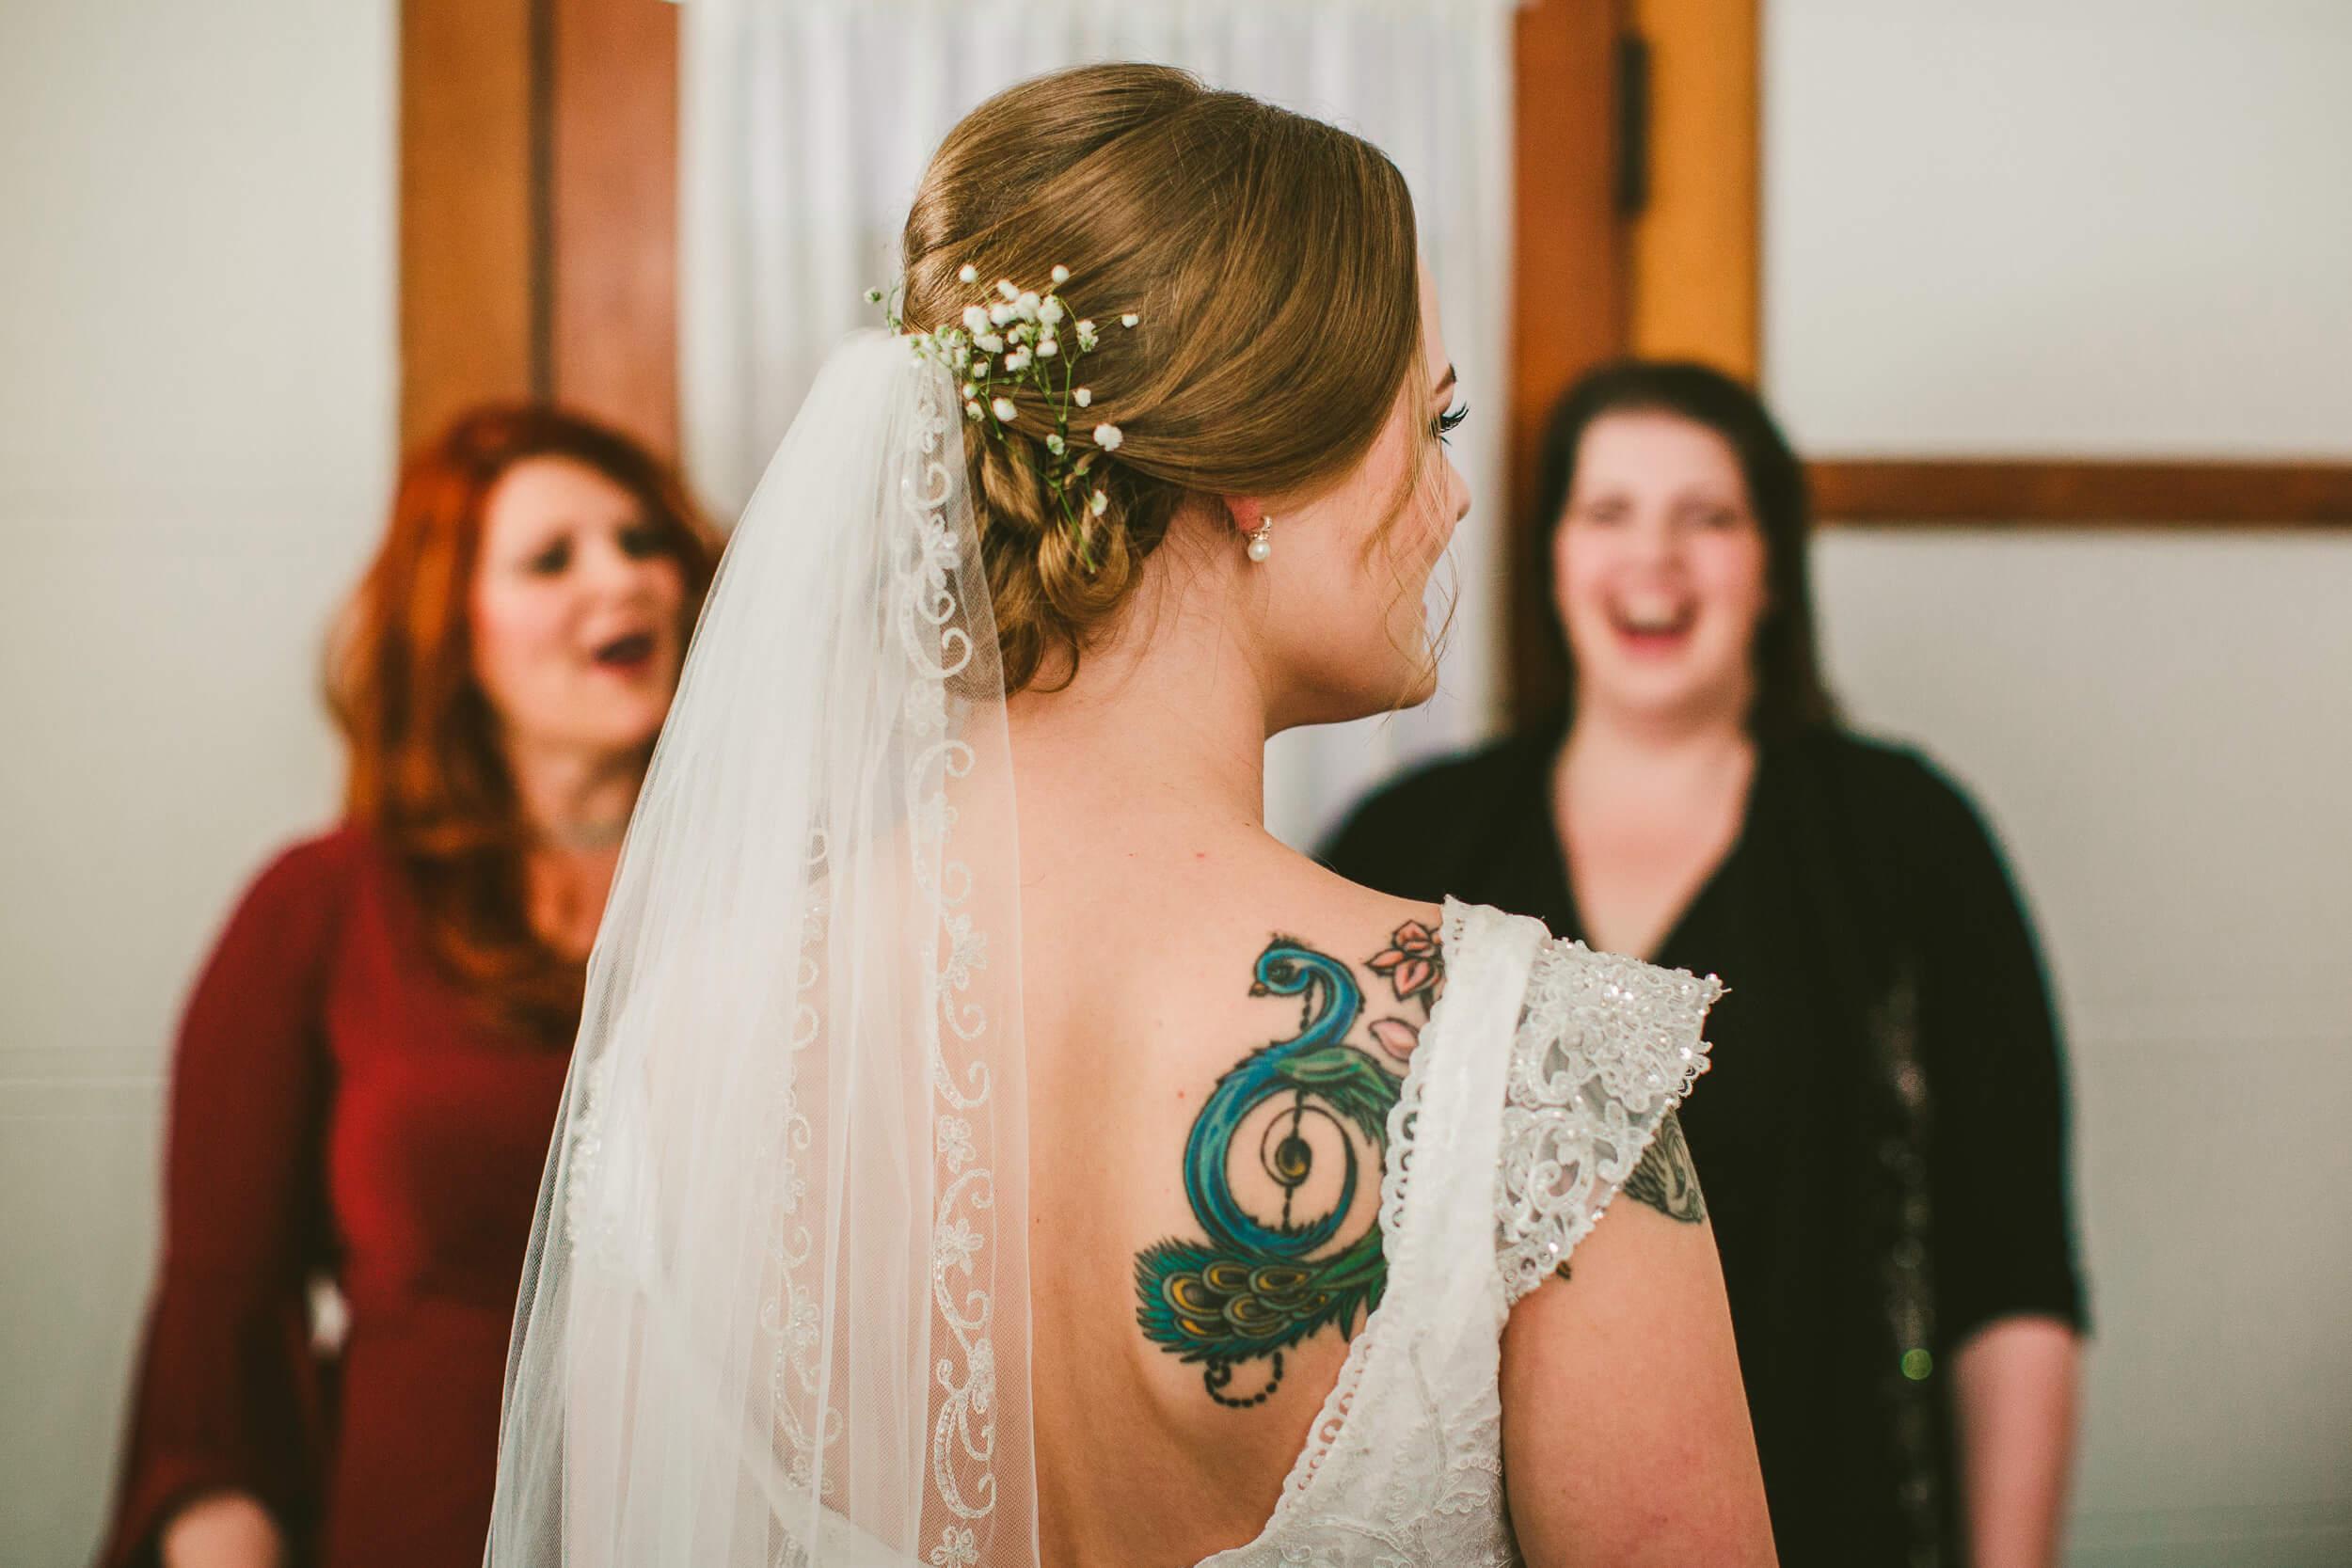 mukogawa winter wedding in spokane (48).jpg